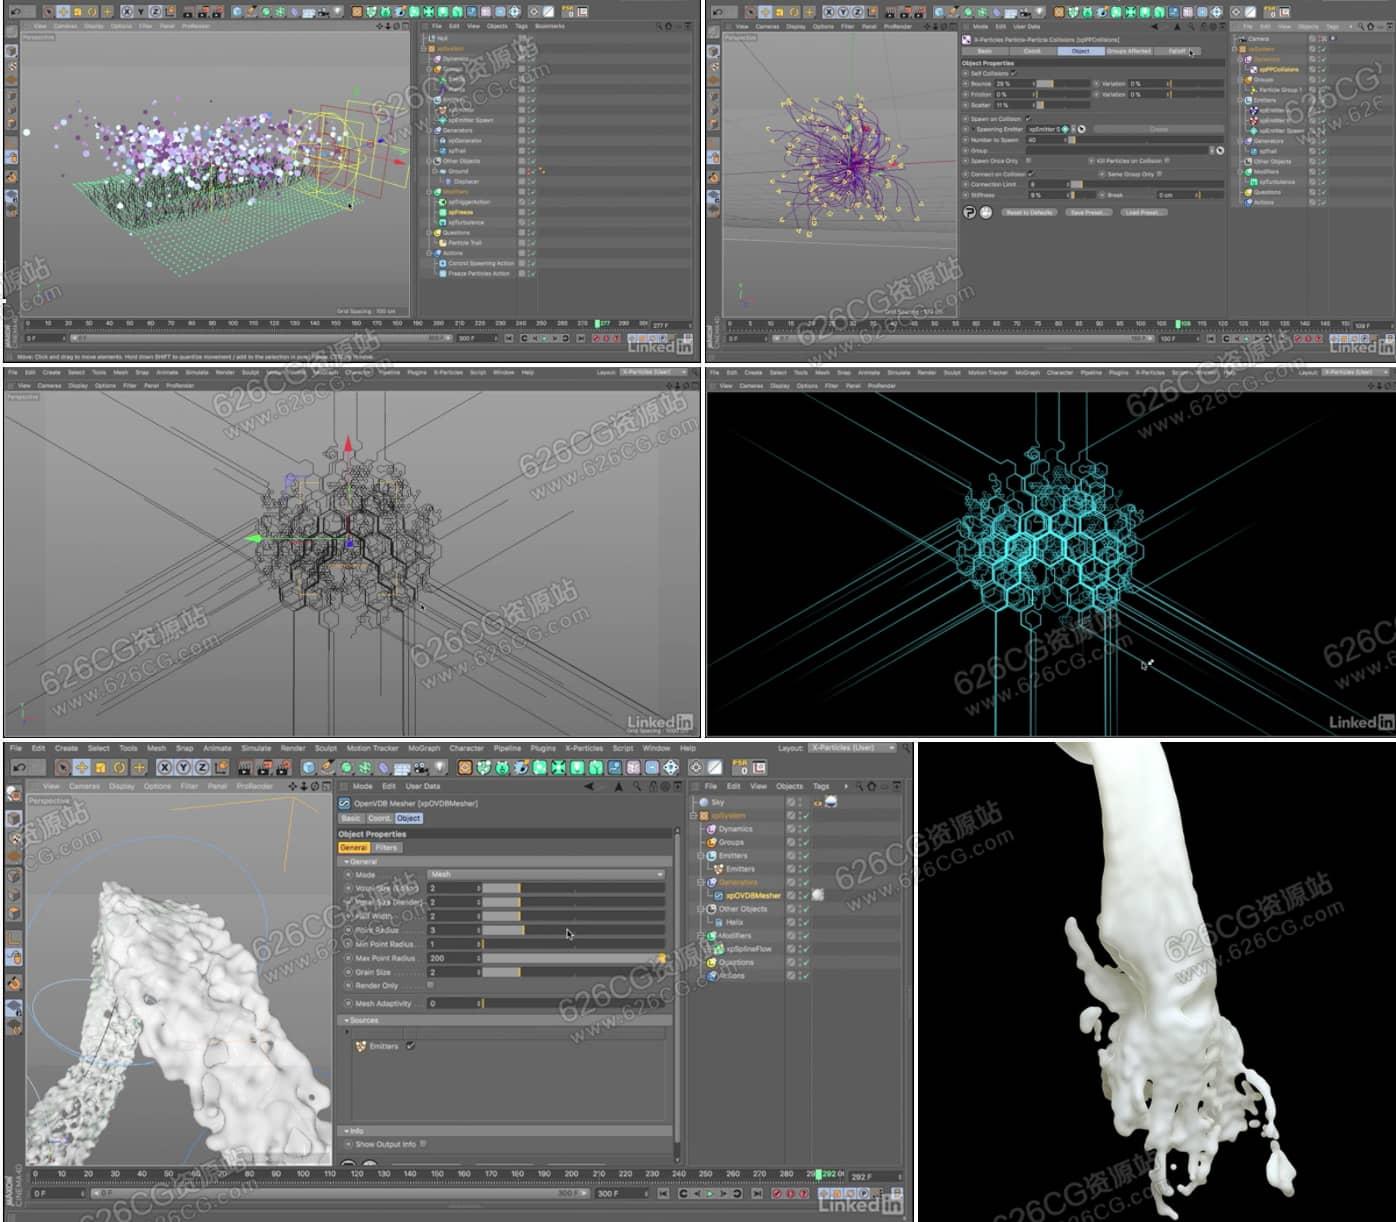 C4D教程:XP粒子基础培训学习X-Particles实用技巧教程 Lynda - X-Particles 4 for Cinema 4D Essential Training 626CG资源站